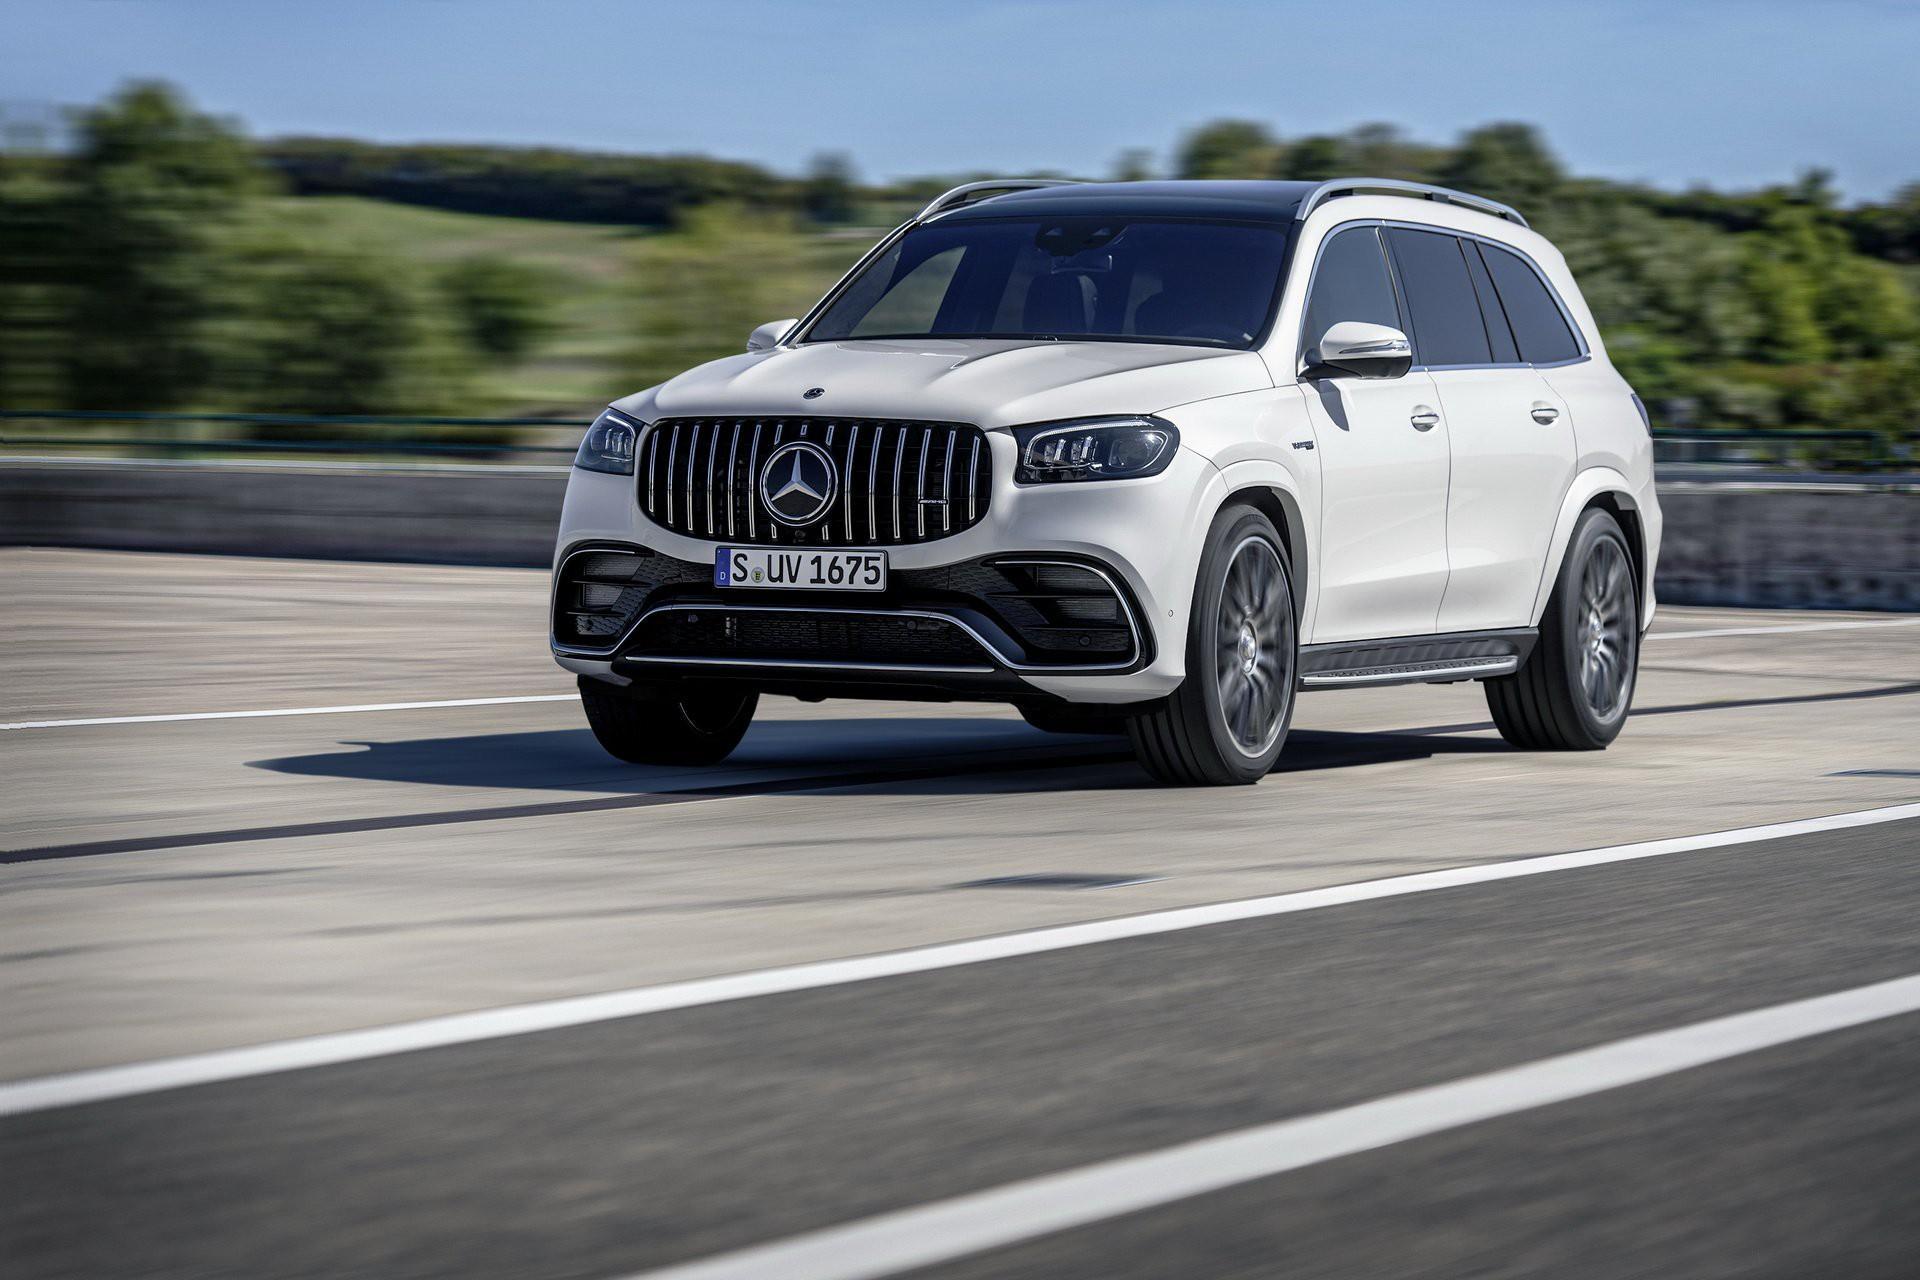 Khám phá Mercedes GLS 63 2020 vừa ra mắt Ảnh 4